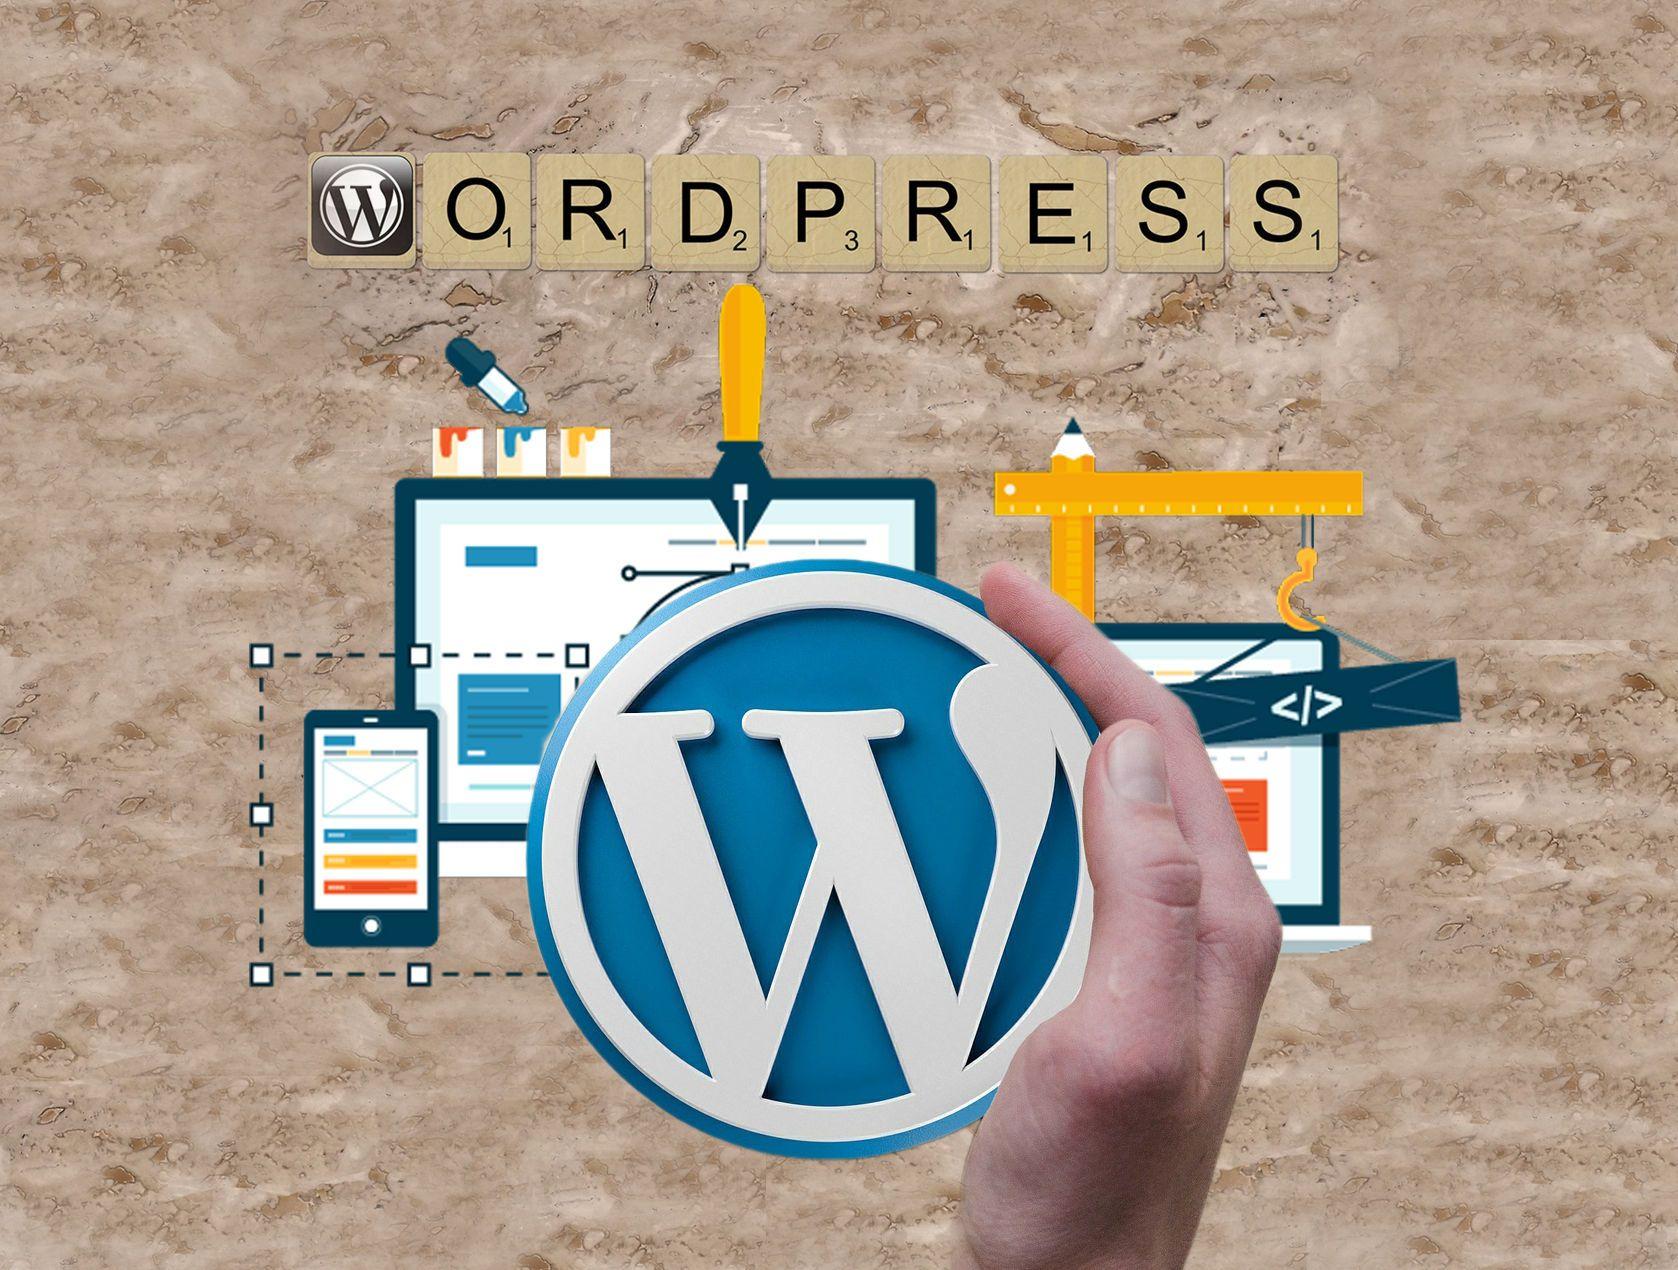 Wordpress Web Design Birmingham Best Cheap Web Designers 0121 663 1831 Https Www Bestcheapwebdesign Co Web Design Wordpress Web Design Online Web Design